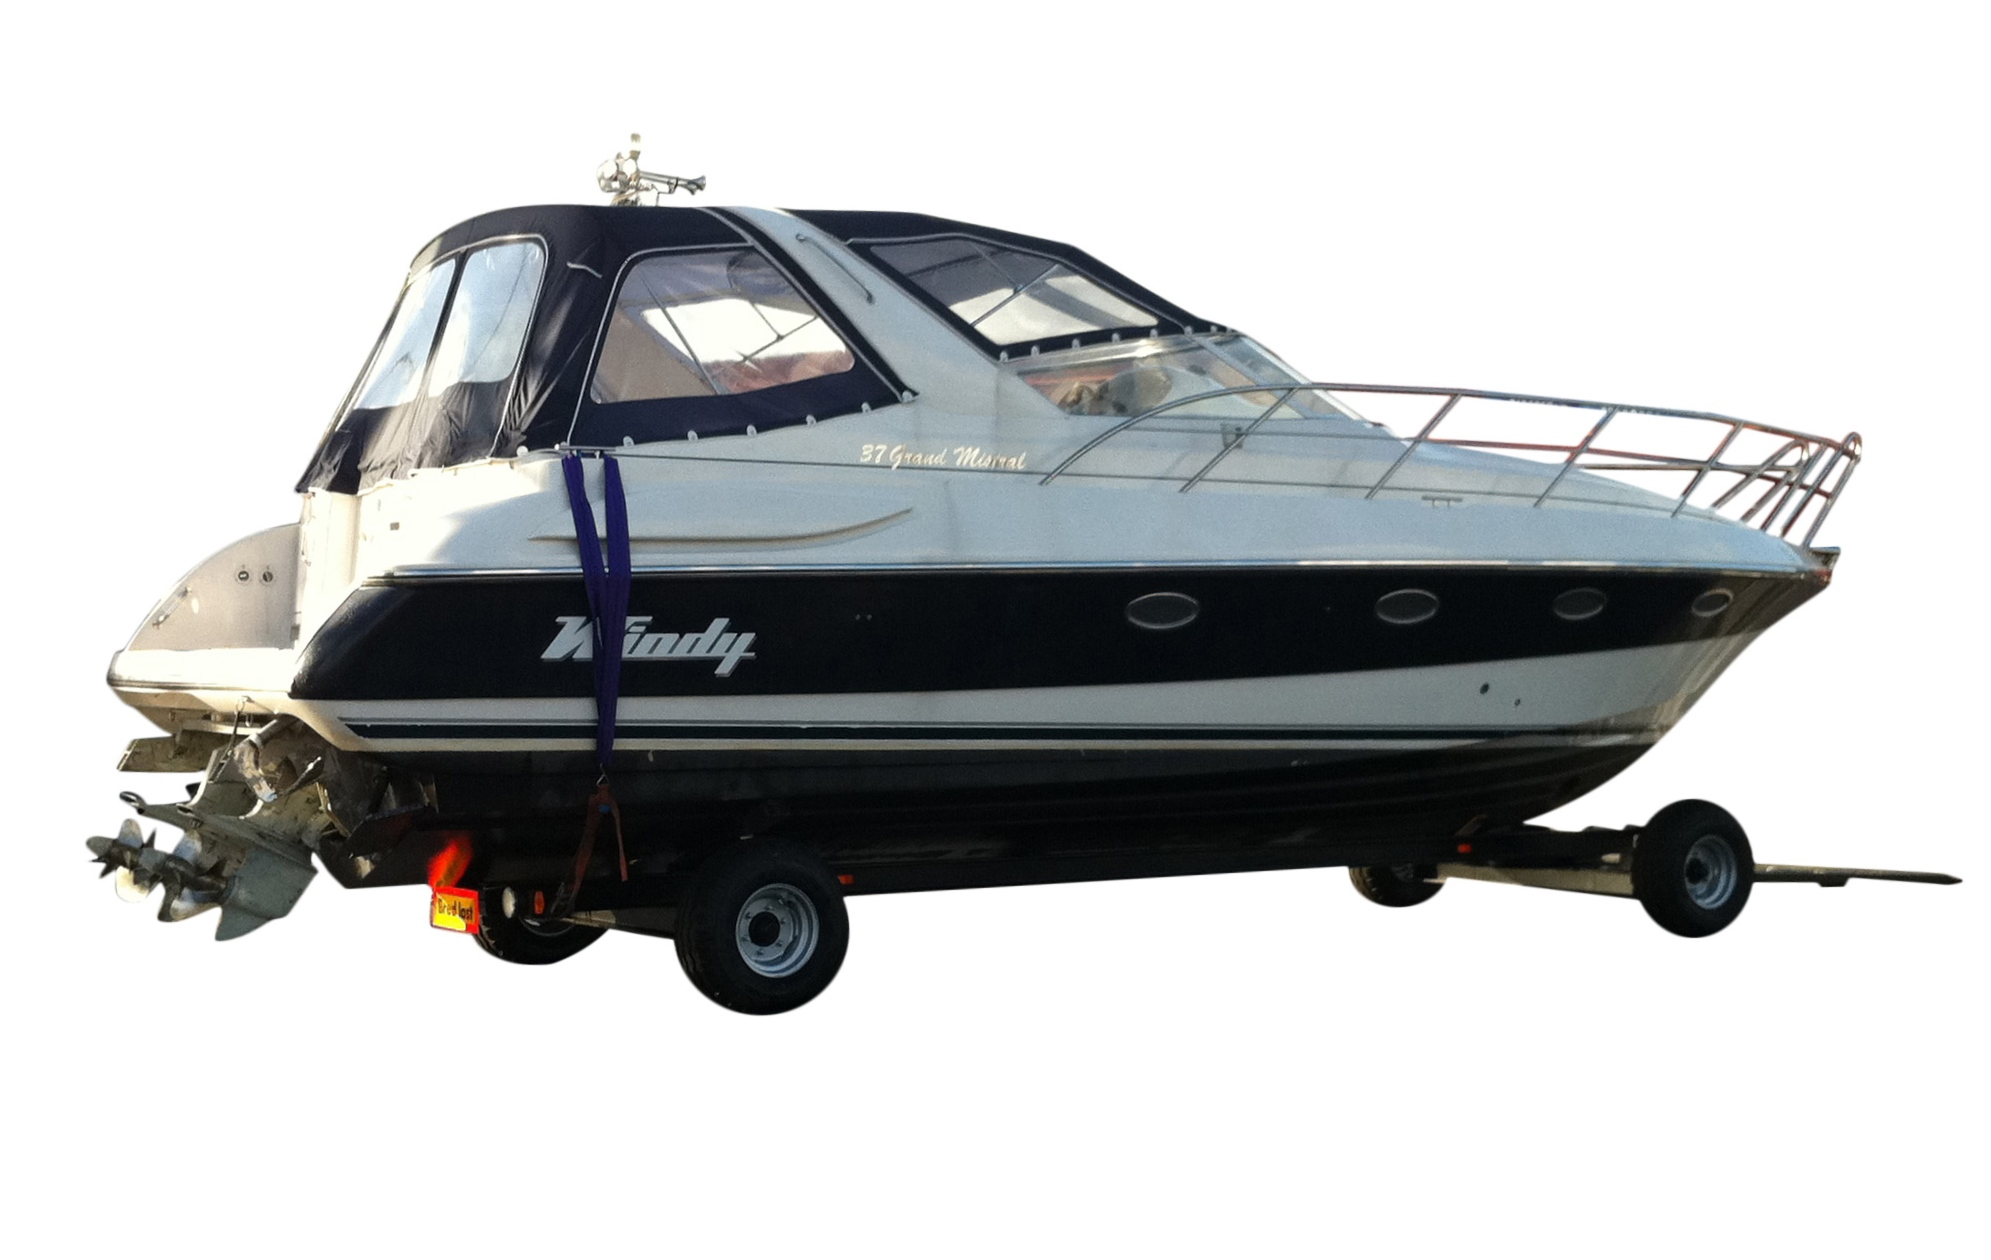 Båtvagn md trailer